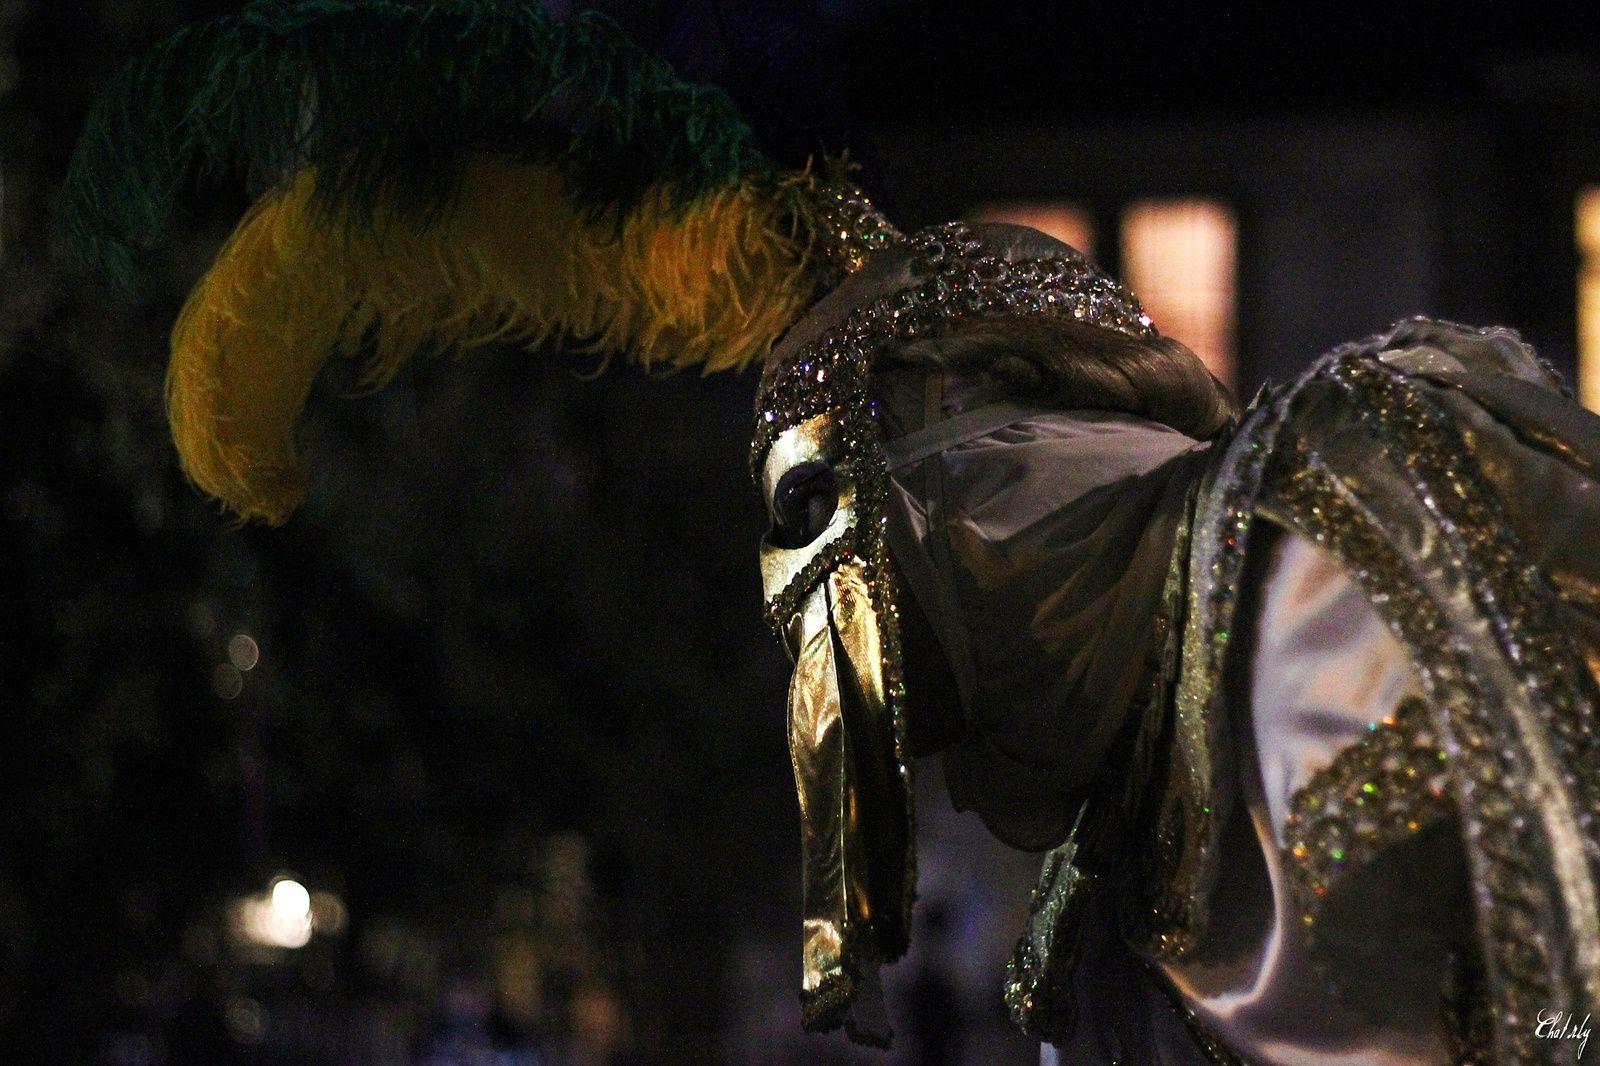 Mardi Gras season (New Orleans, LOUISIANA)